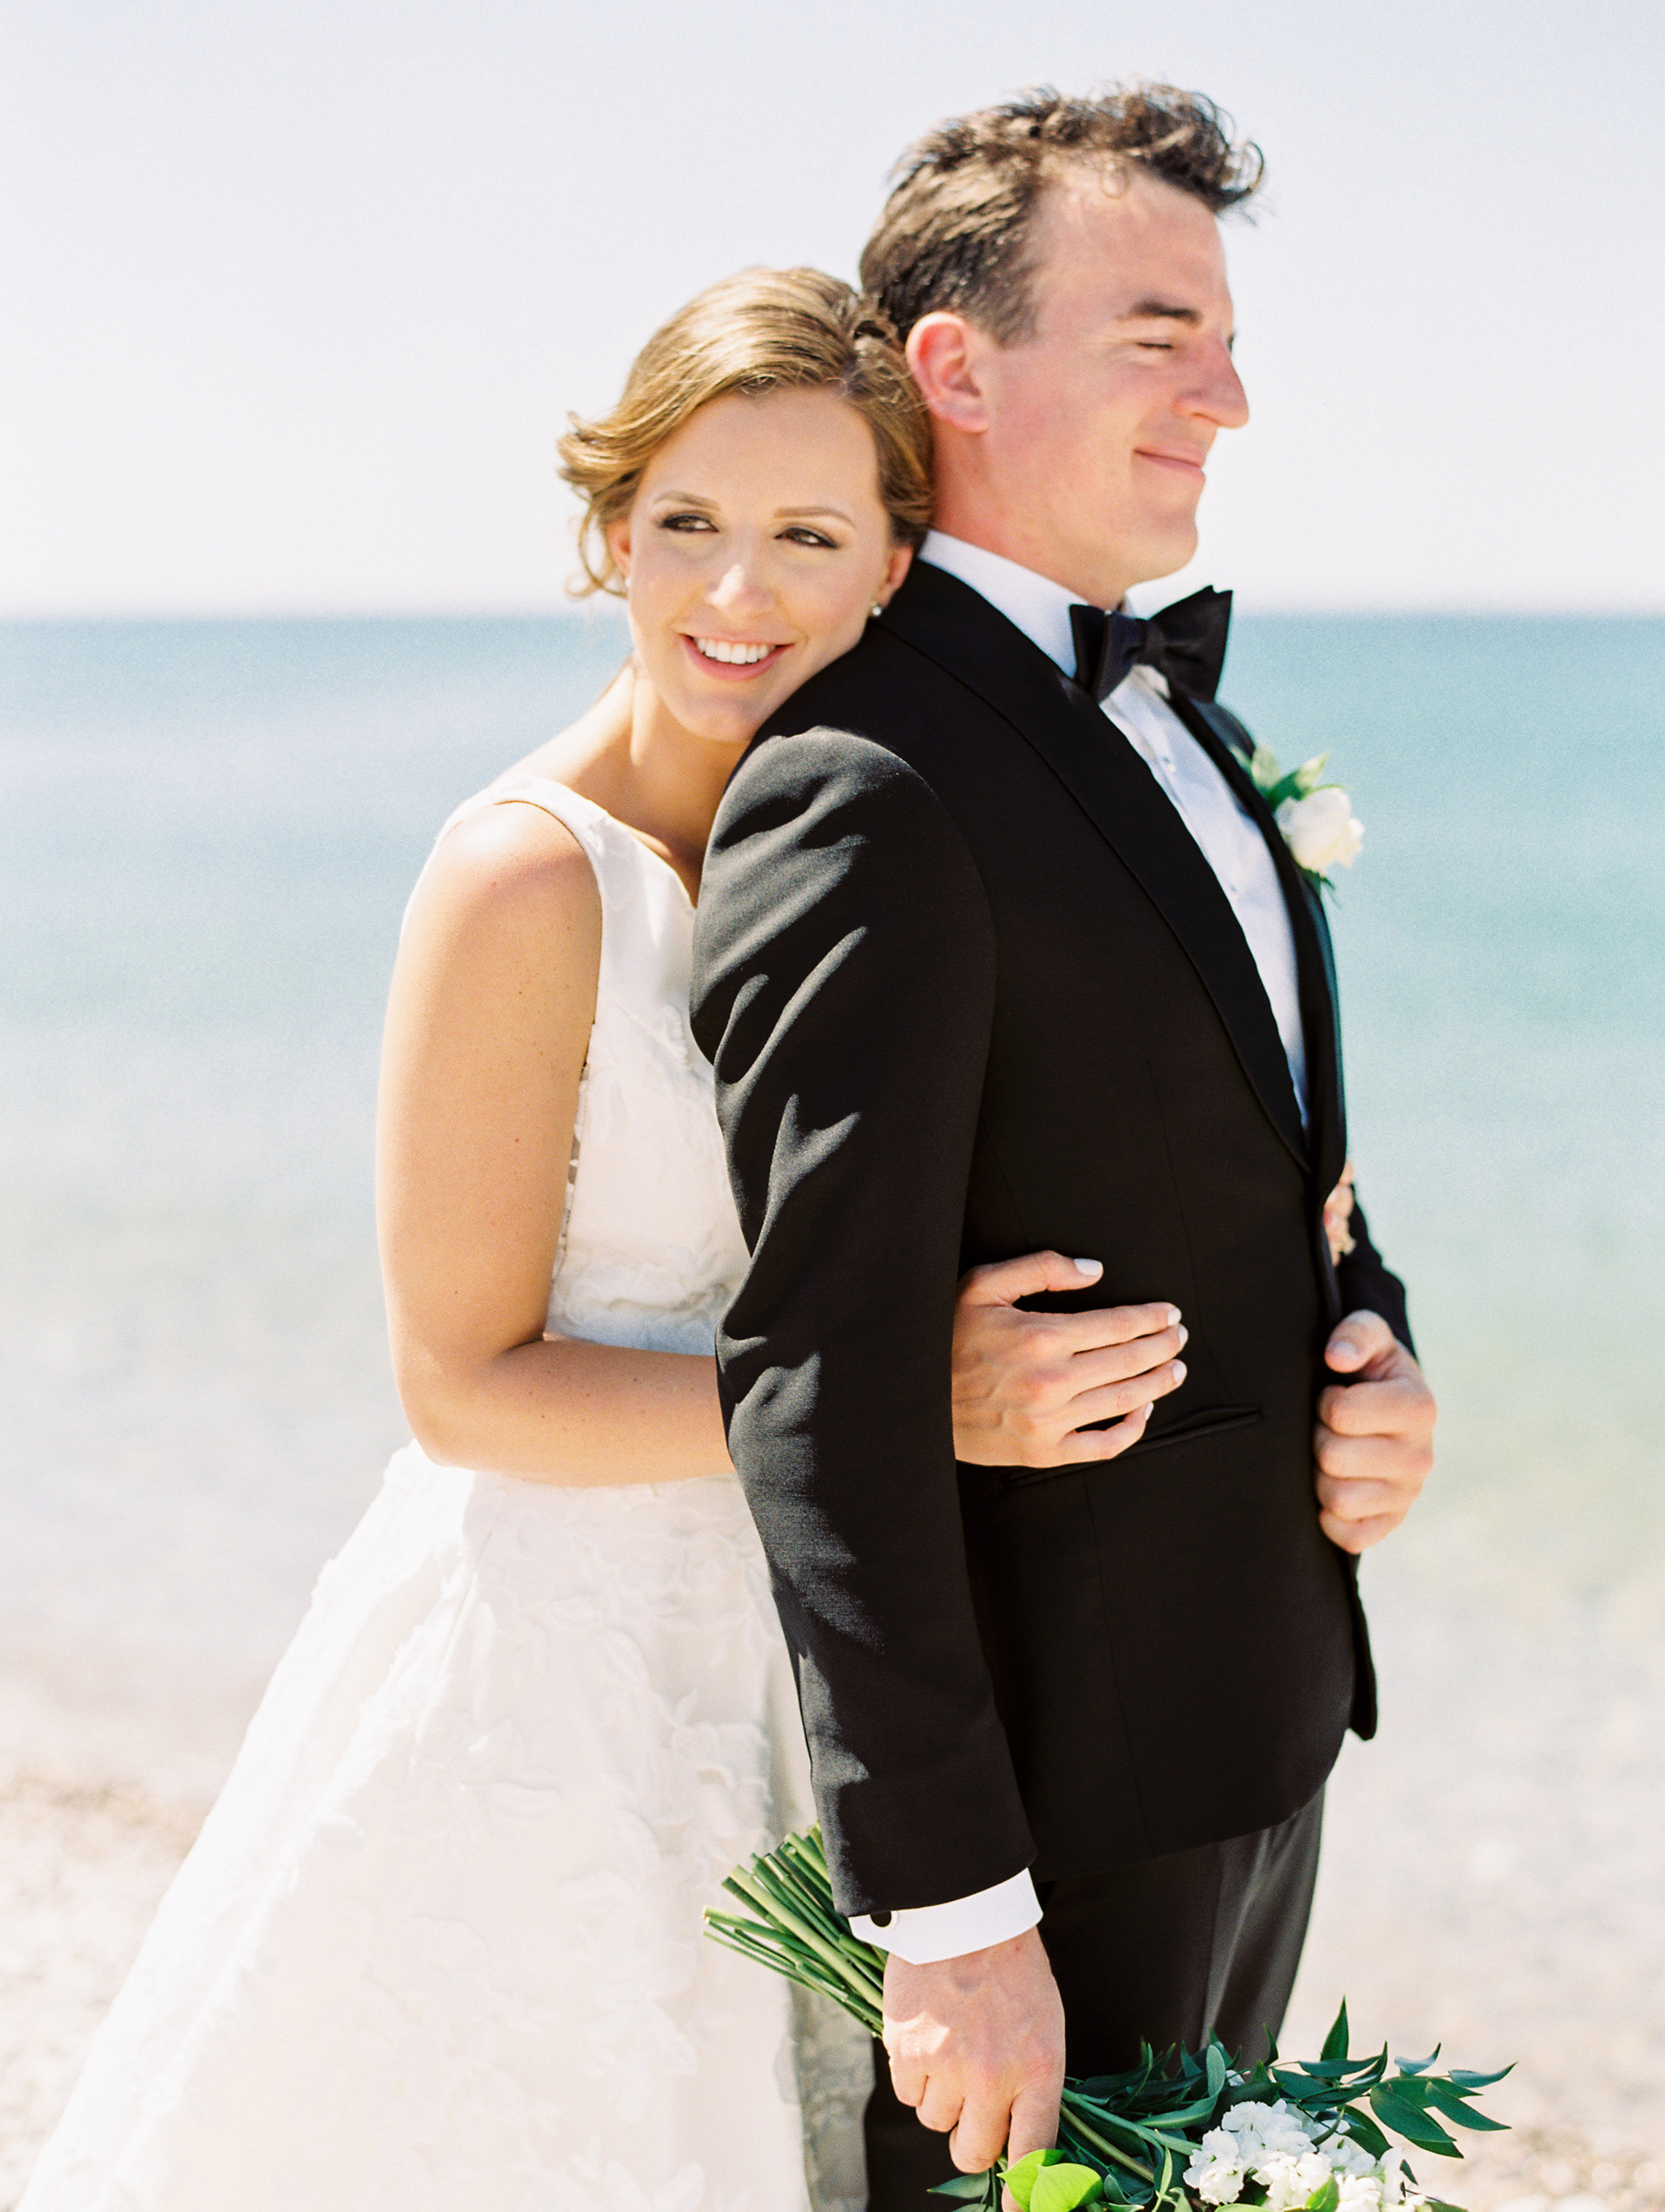 DeGuilio+Wedding+Bridal+Partyf-103.jpg